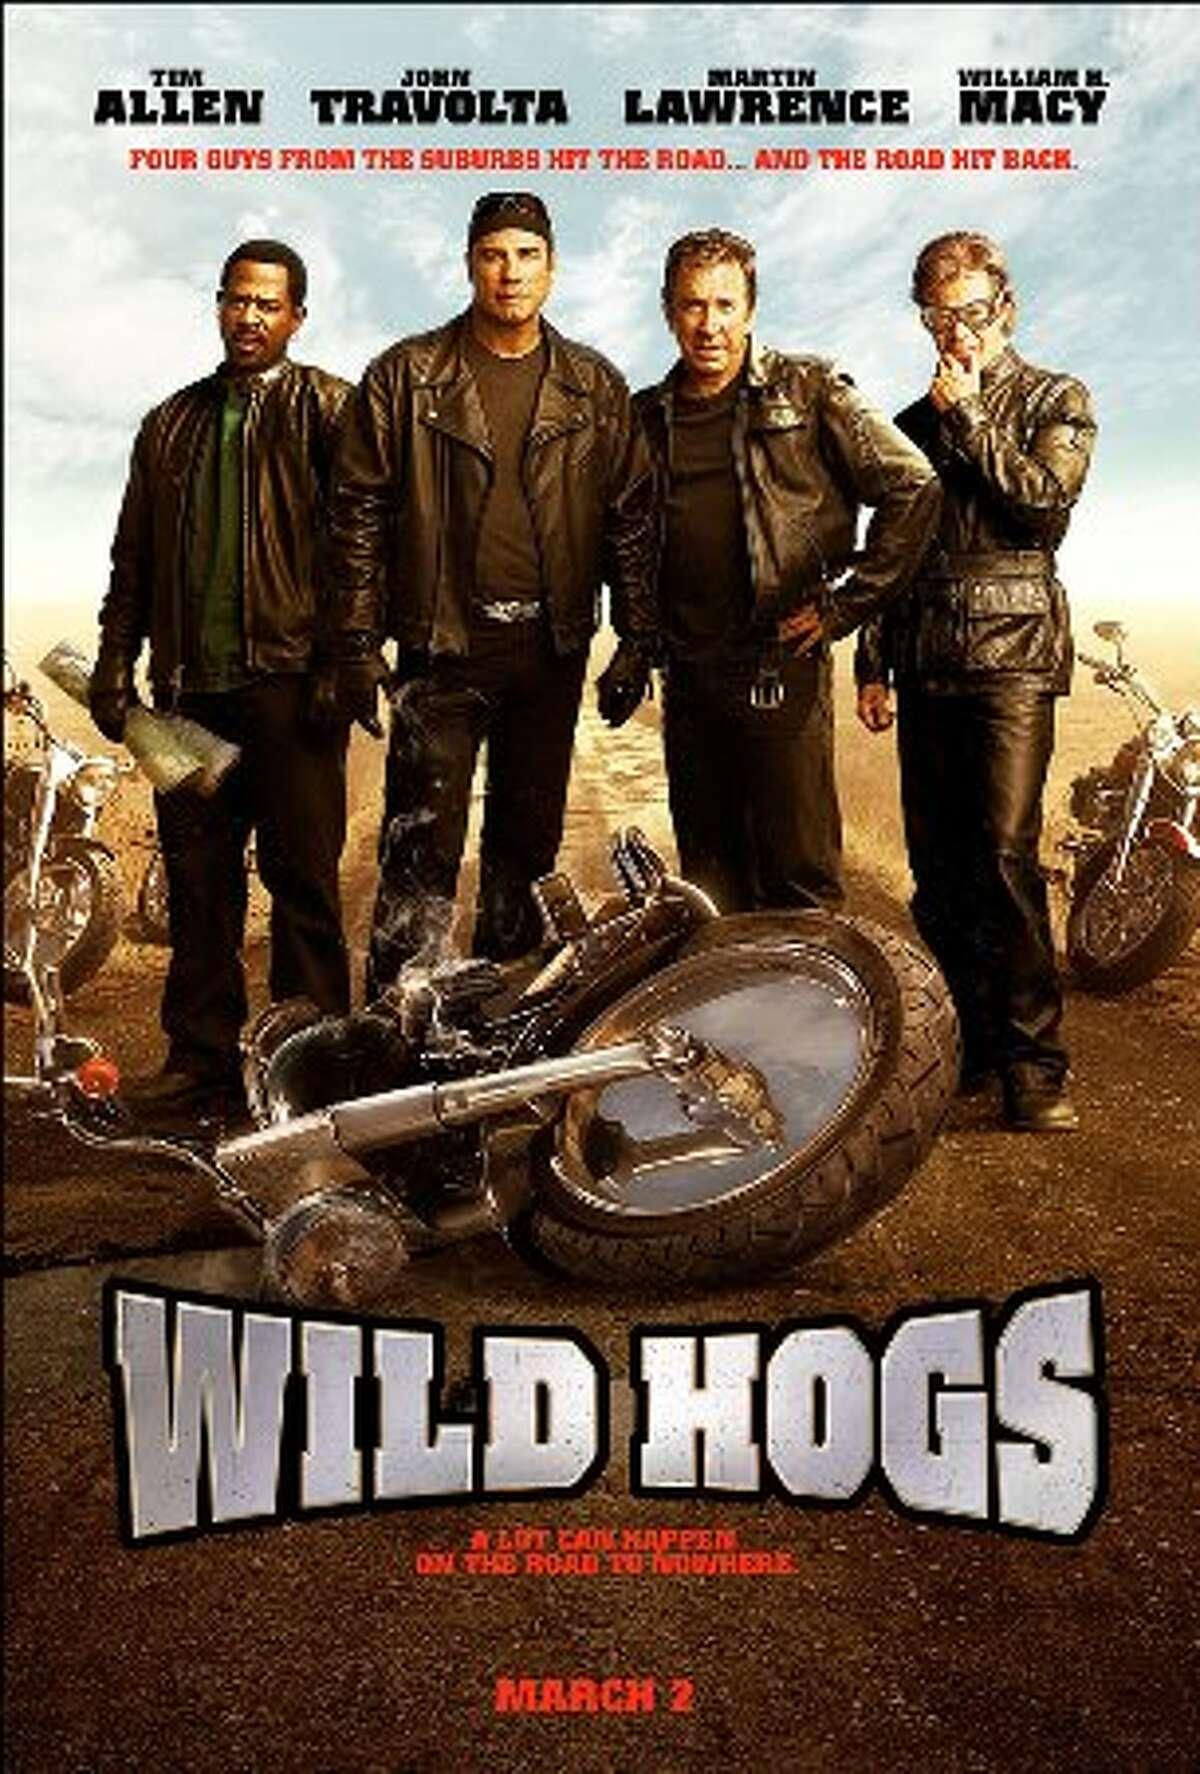 Wild Hogs (2007) Starring:Tim Allen, John Travolta, Martin Lawrence Audience Score: 61 Tomatometer: 14 Source: Rotten Tomatoes